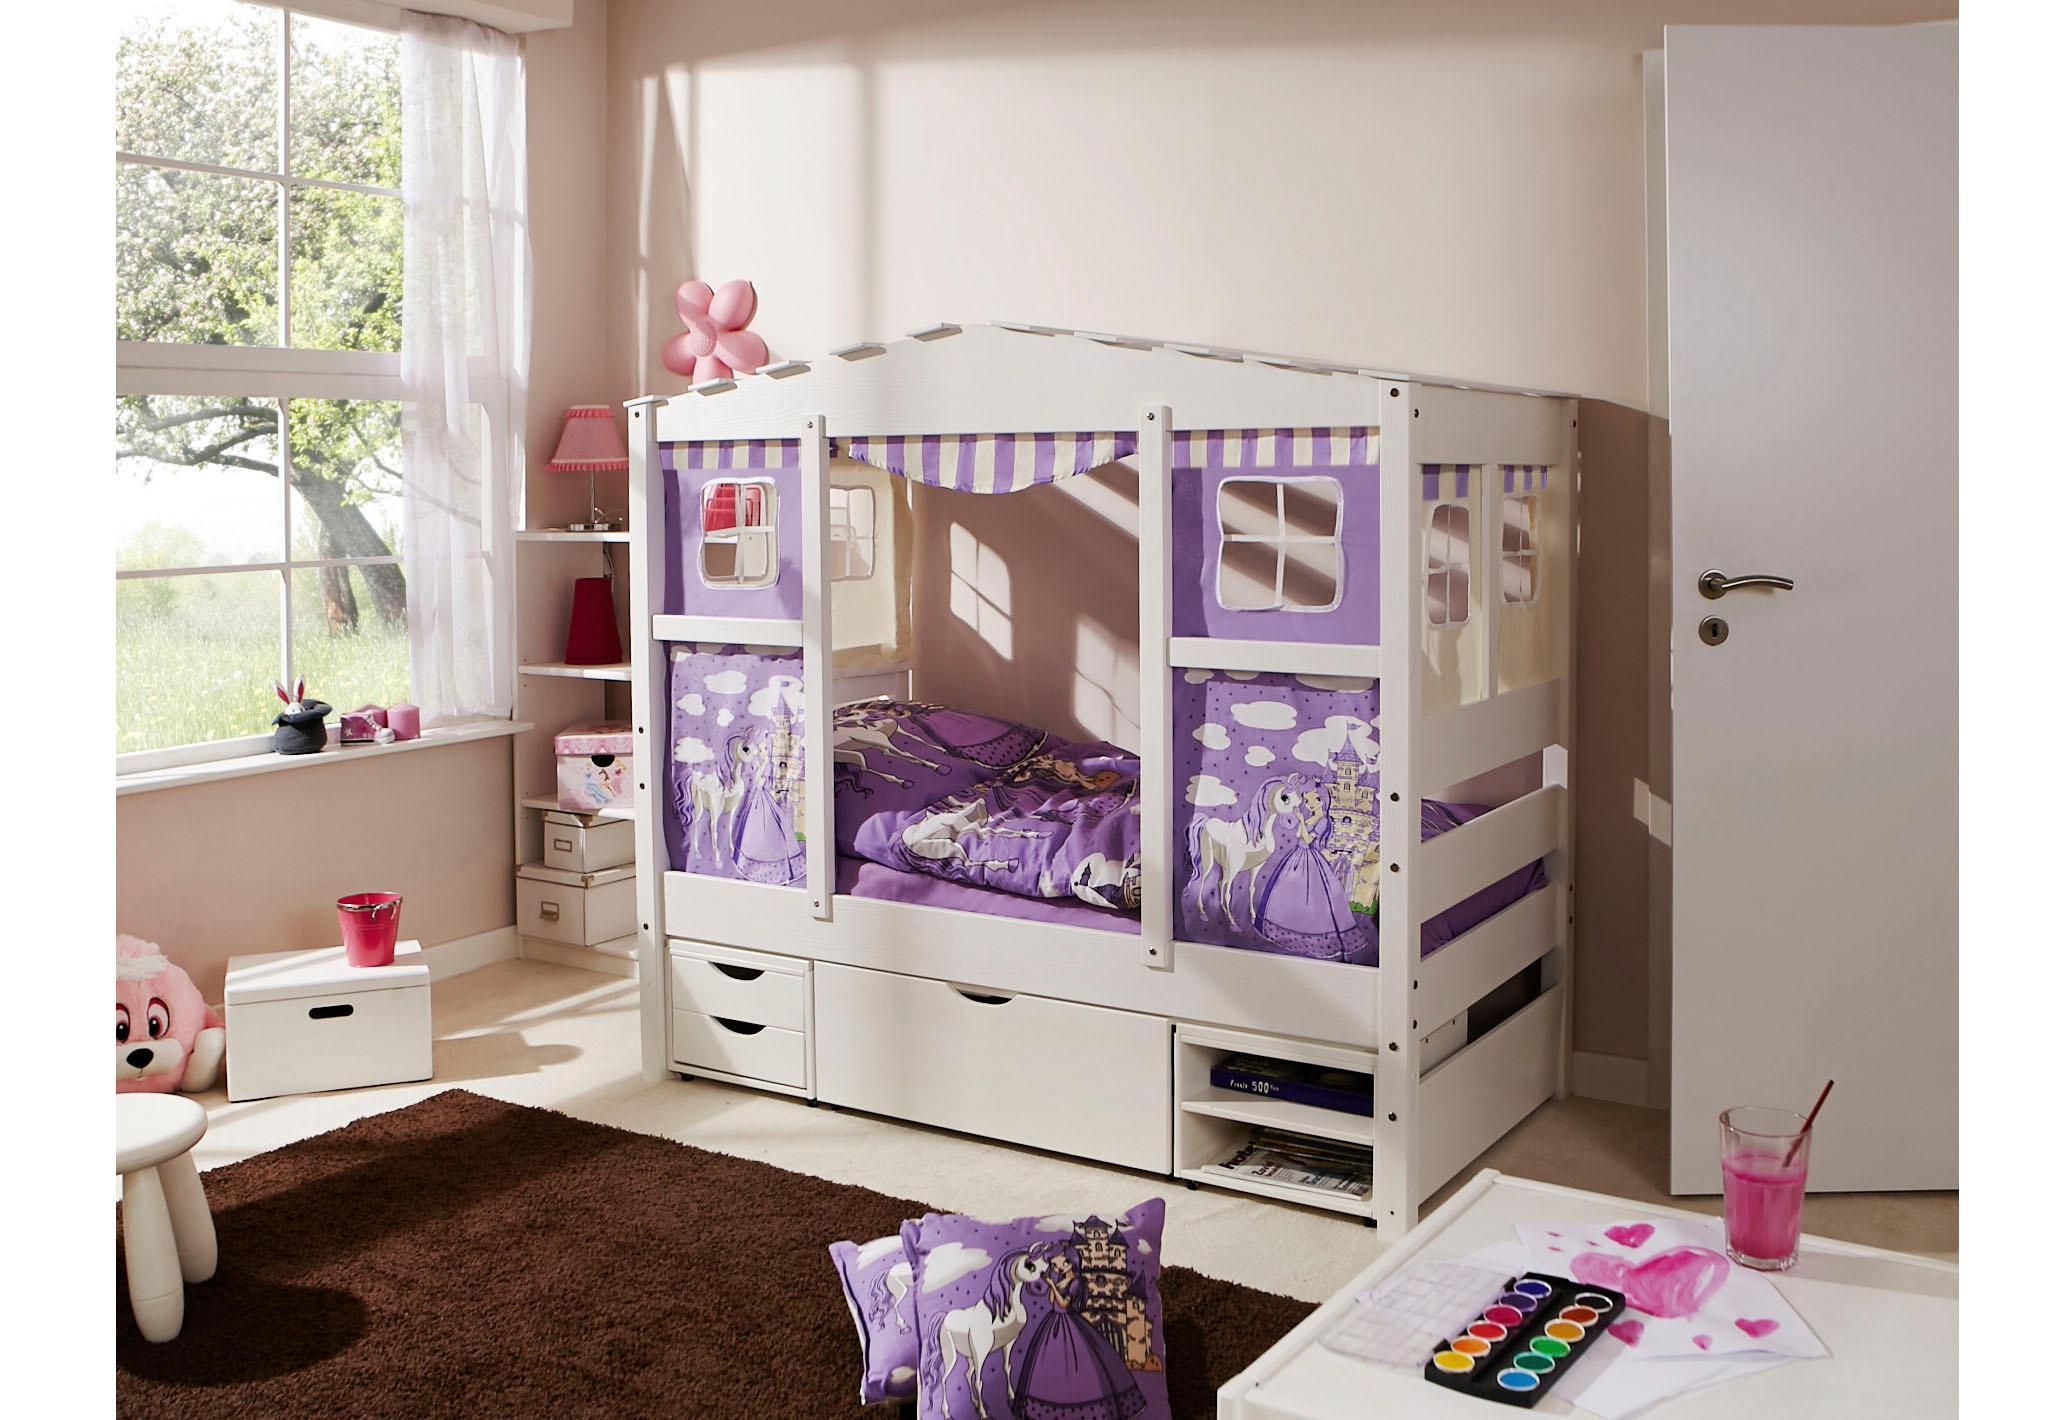 Ticaa Kinderbett in Hausoptik »Lio« aus massiver Kiefer, Liegefläche 80x160 cm | Kinderzimmer > Kinderbetten > Kinderbetten | Lila | Textil - Kiefer | TICAA